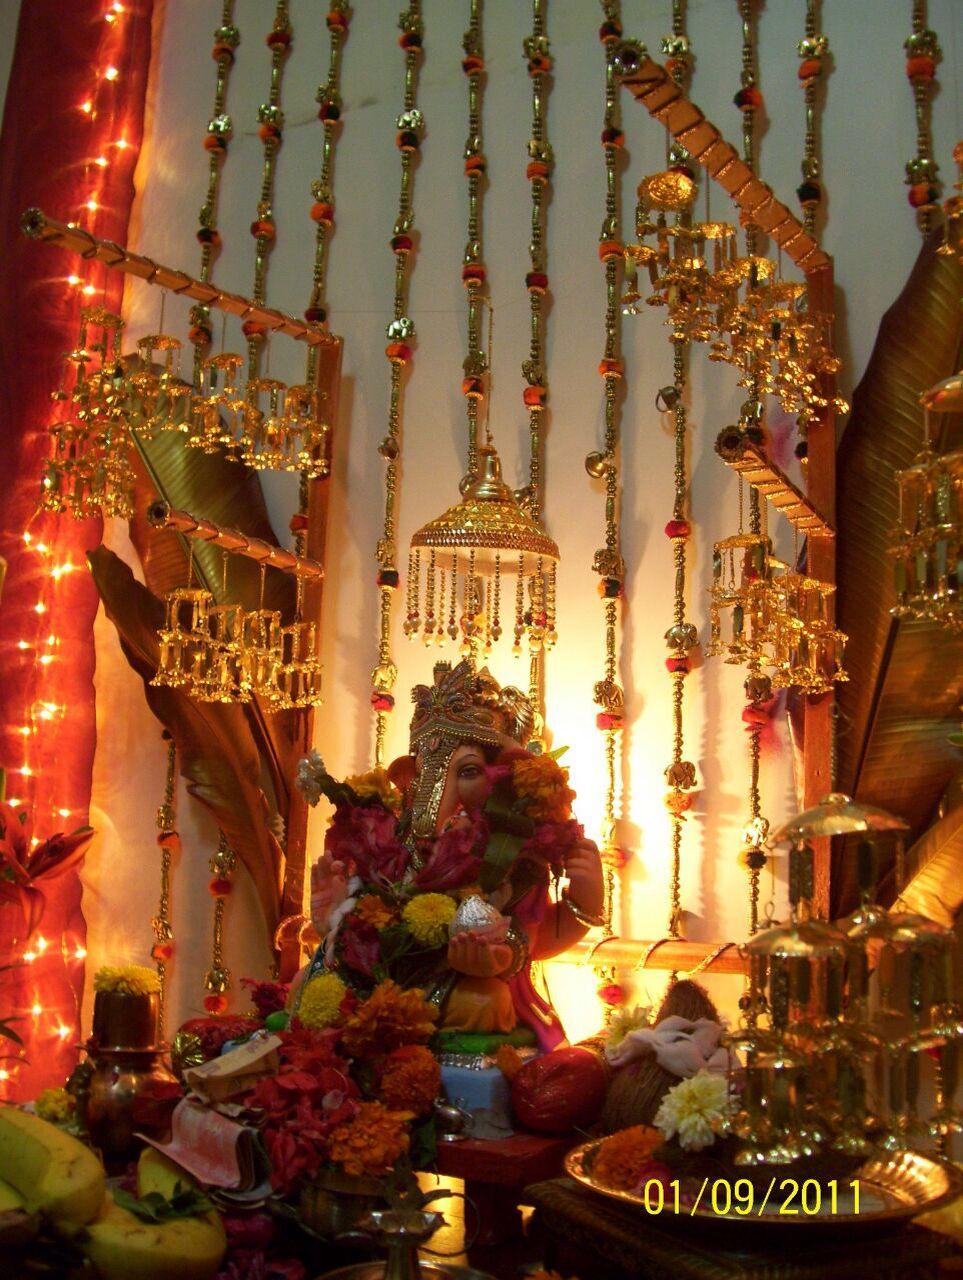 Decoration For Ganpati Ganpati Decoration Design Decoration For